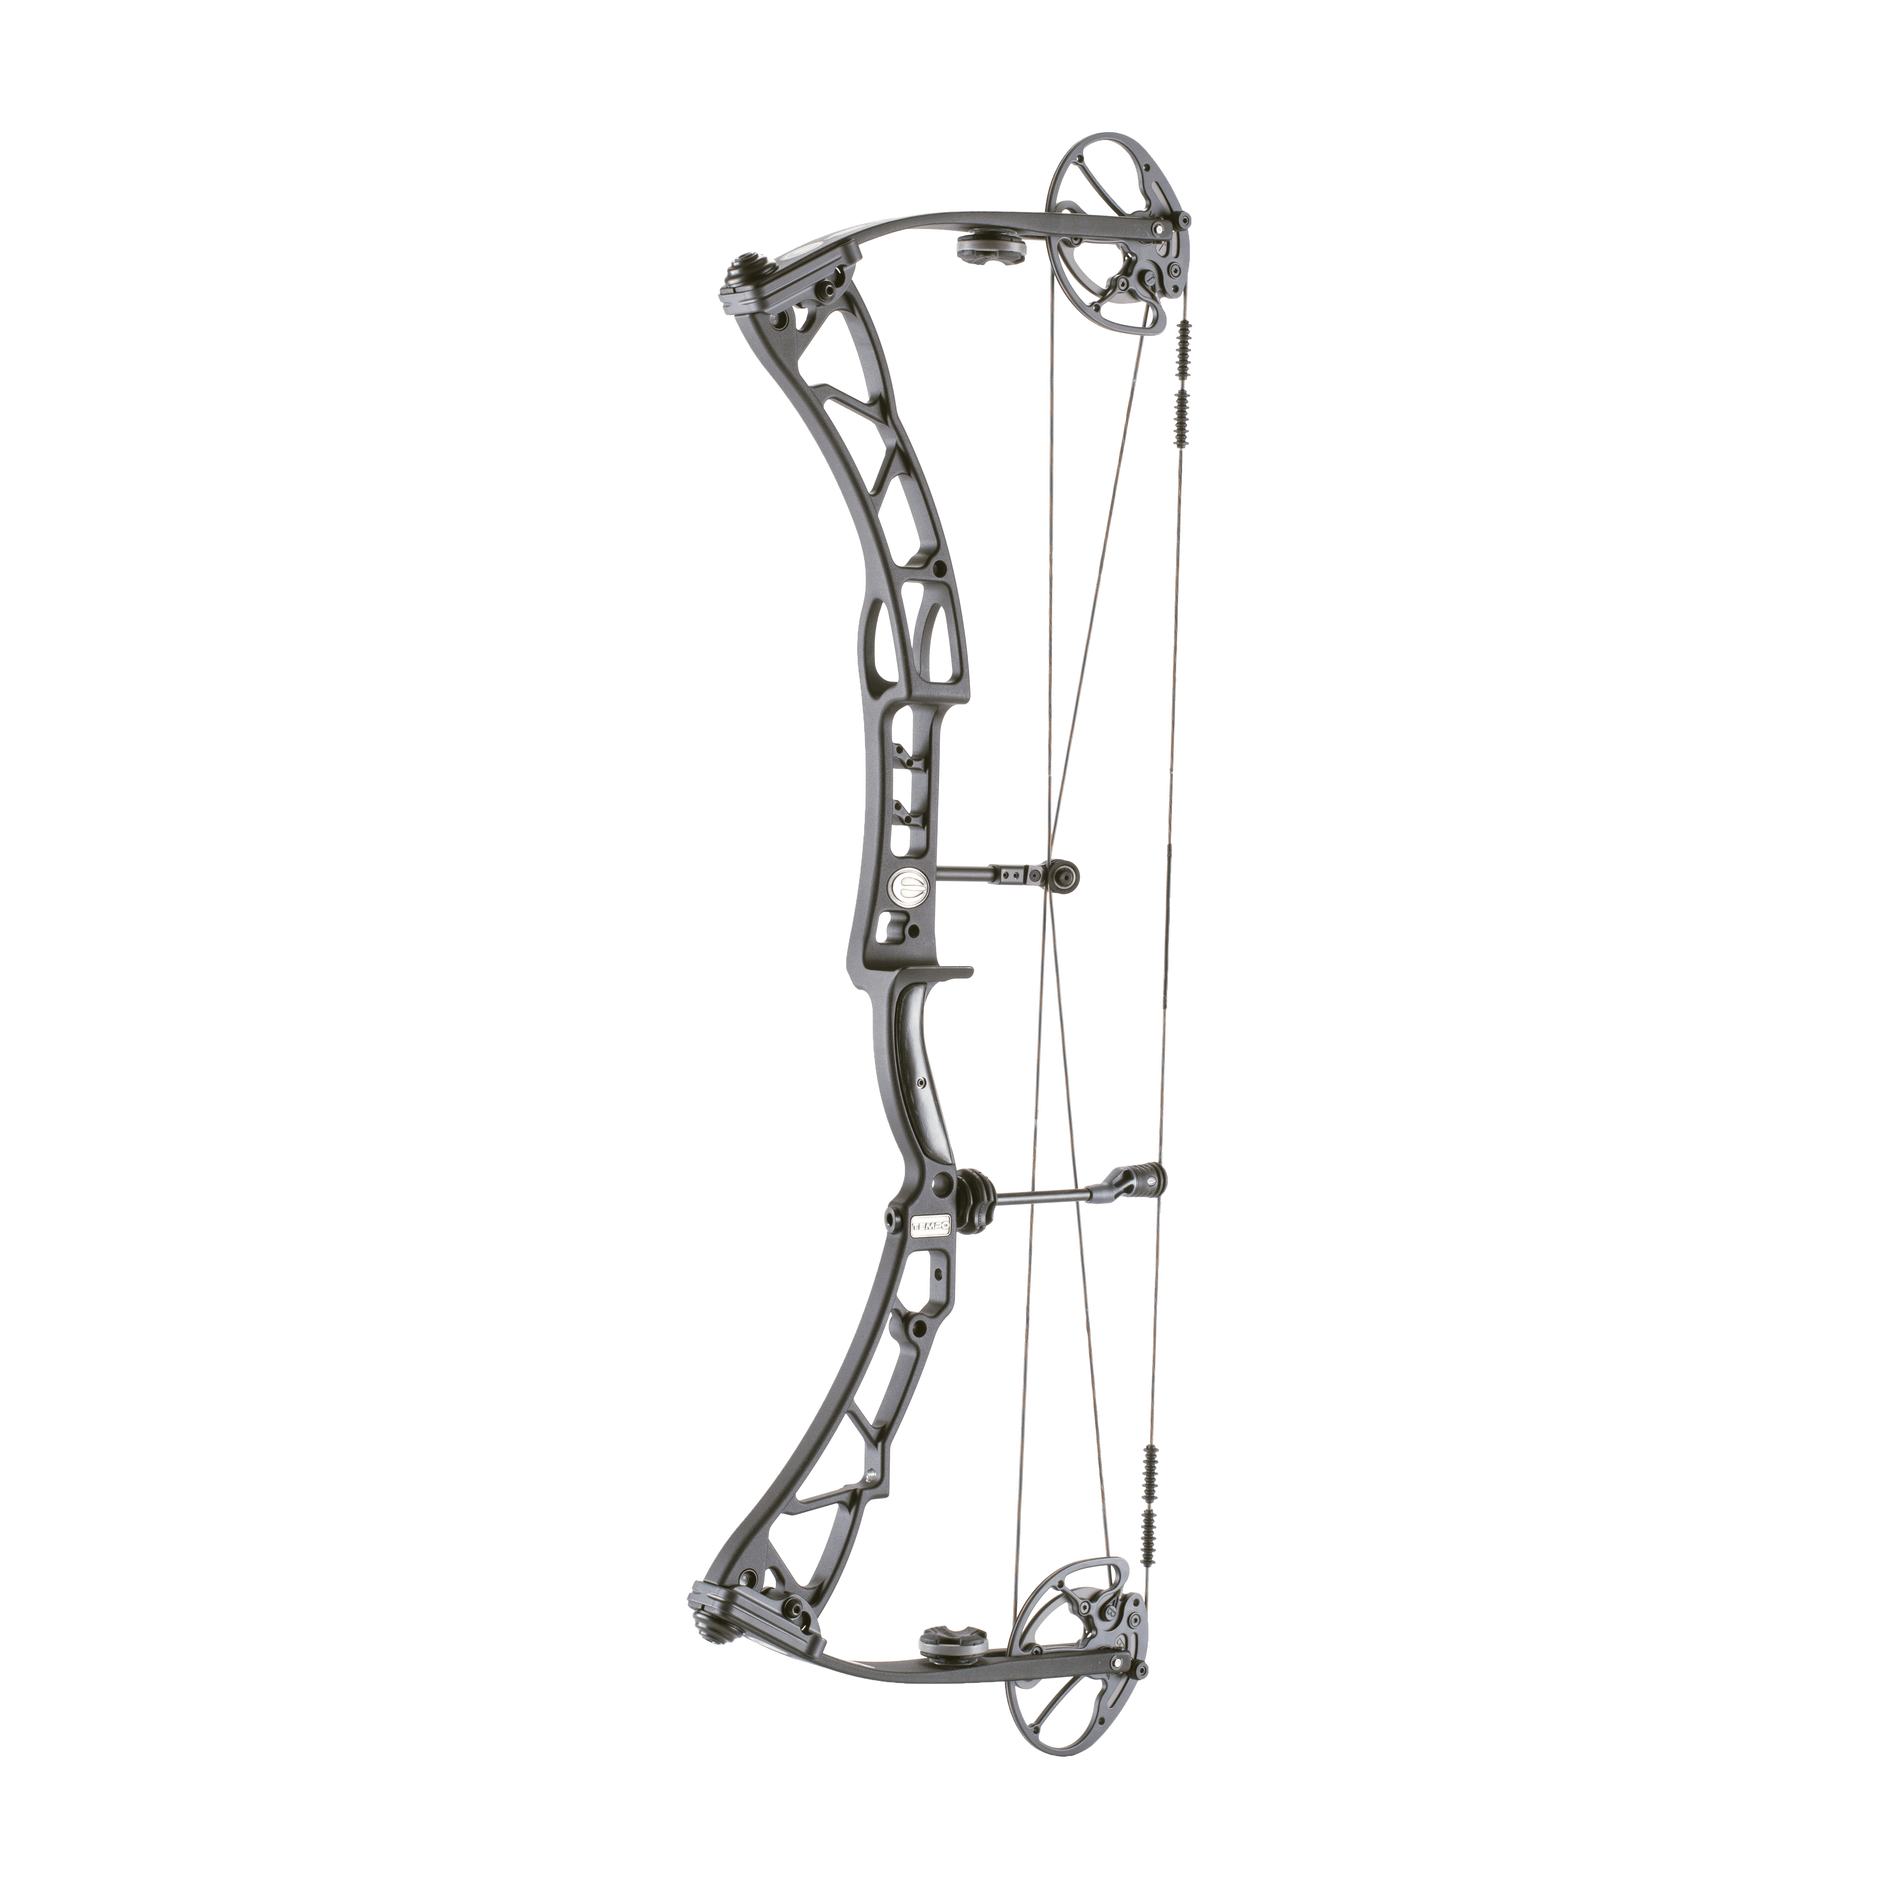 Elite archery Tempo compound bow